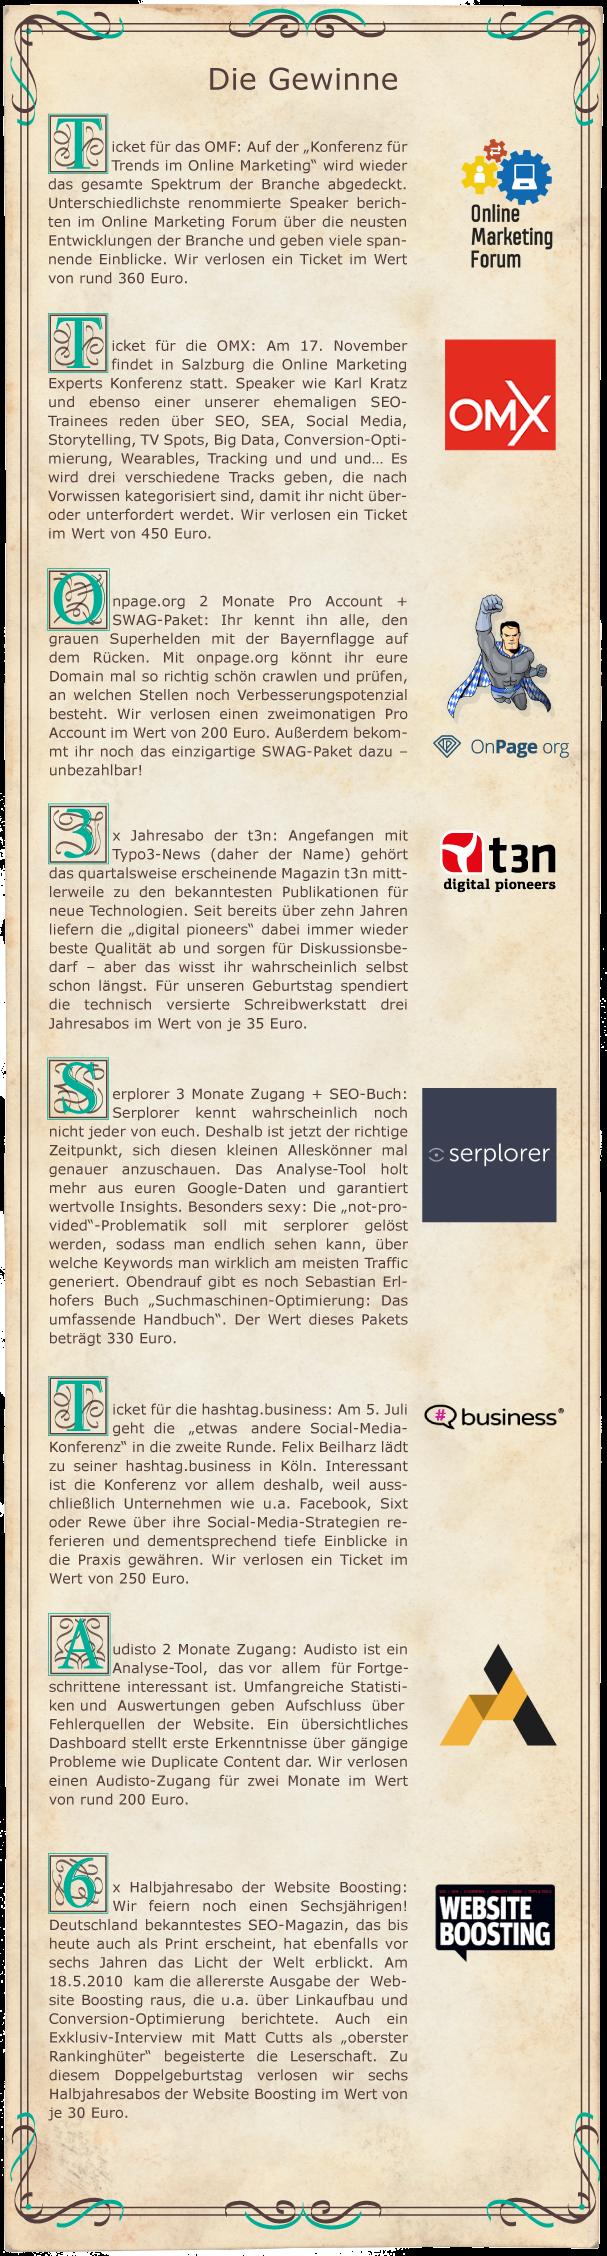 seo-trainee-schriftrolle-gewinne-3